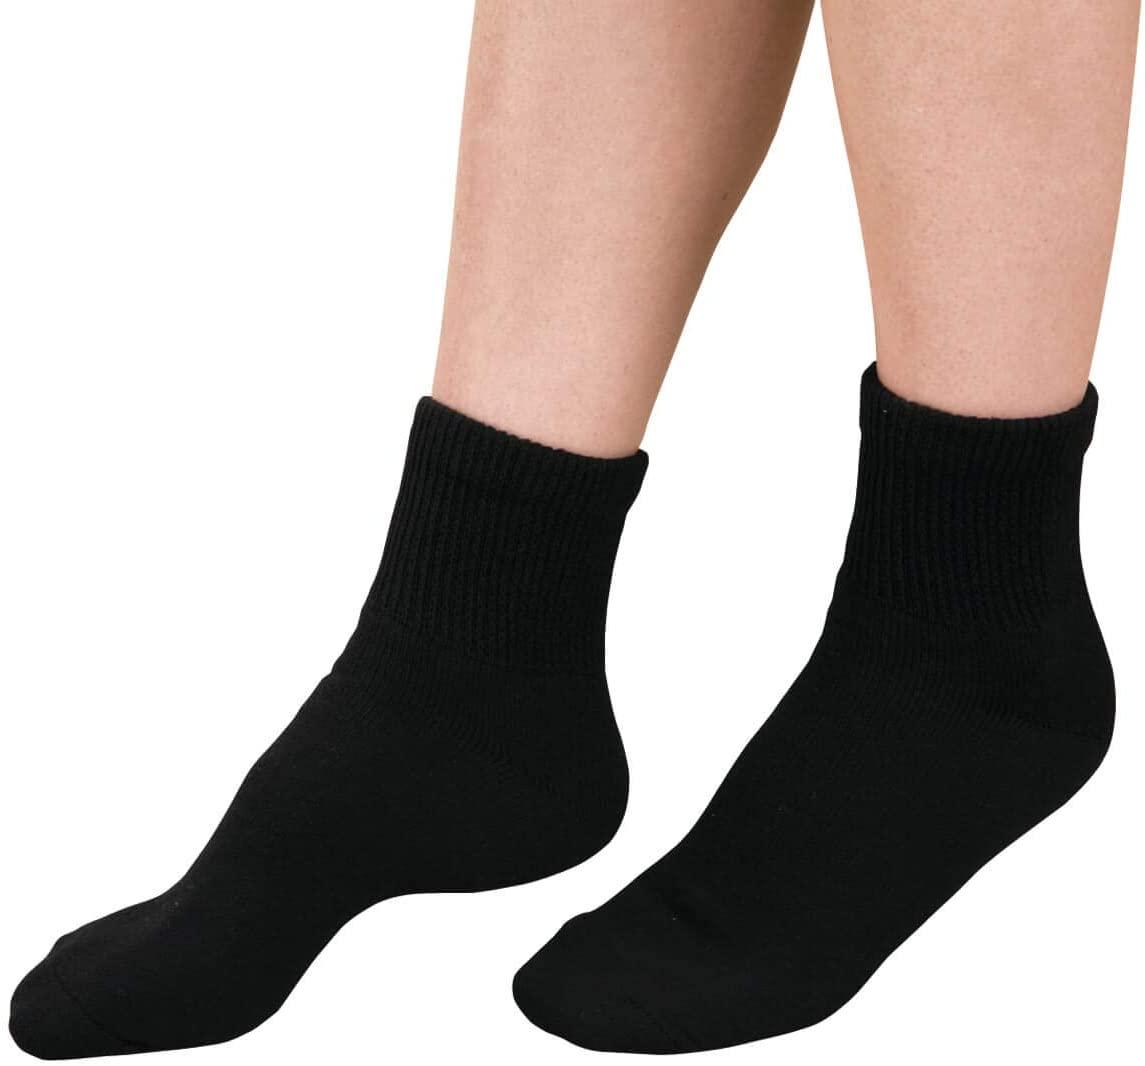 Diabetic Ankle Socks - 3 Pack, Large, Black